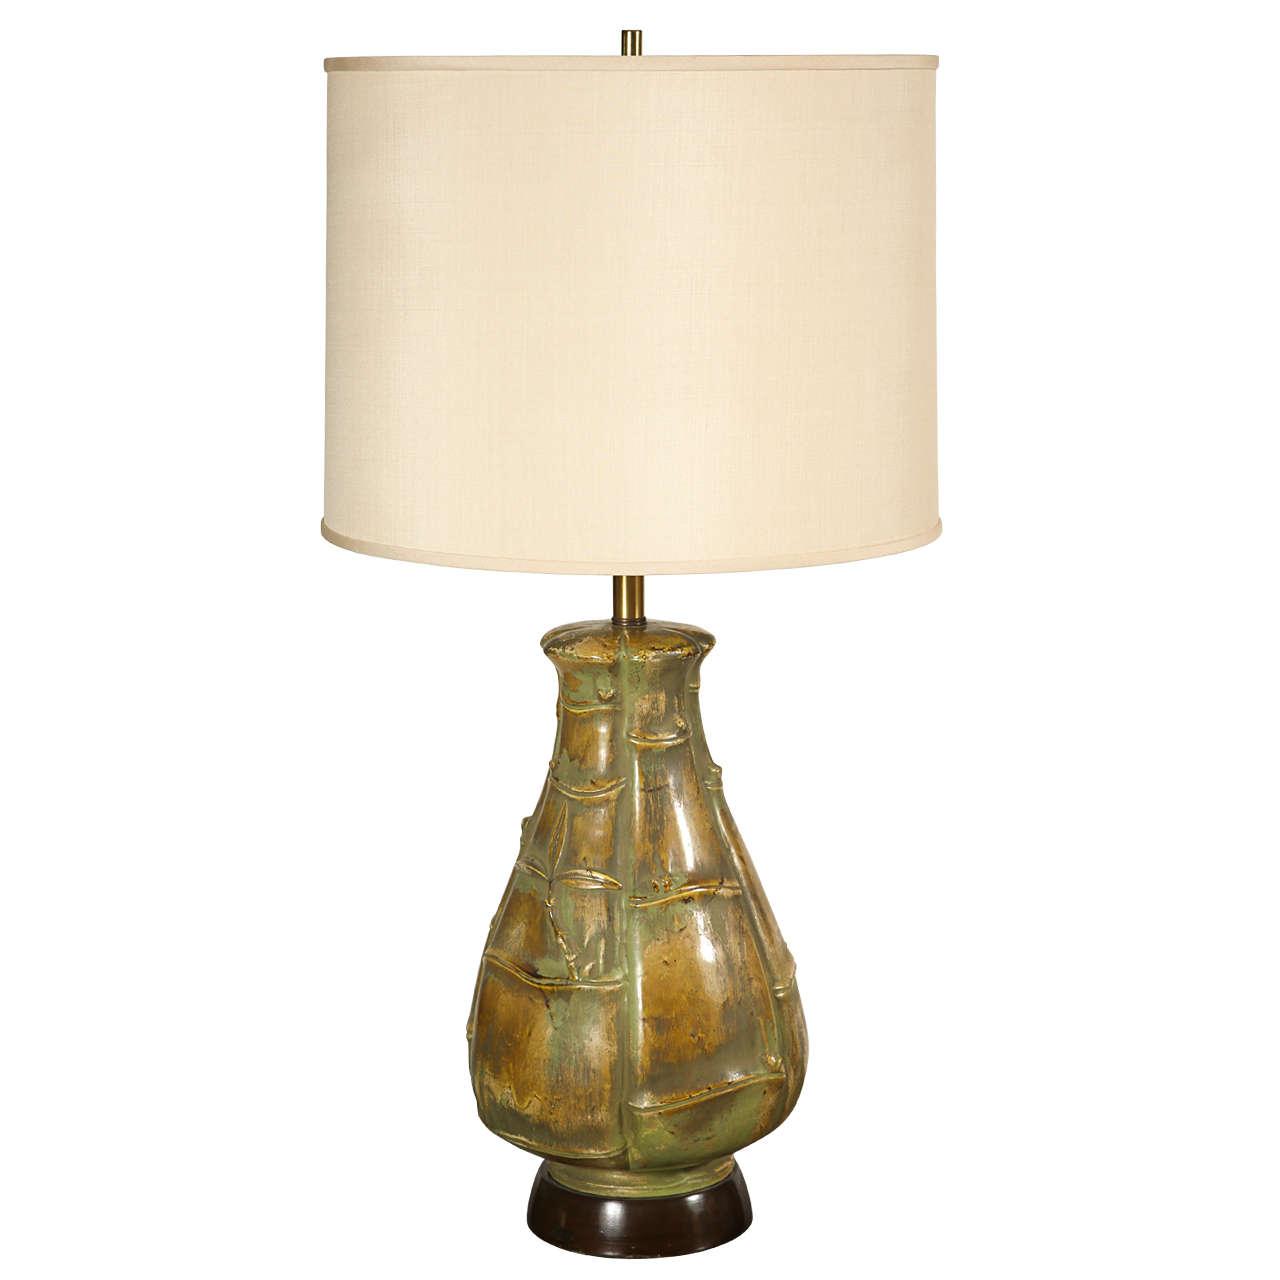 arts and crafts style ceramic lamp at 1stdibs. Black Bedroom Furniture Sets. Home Design Ideas